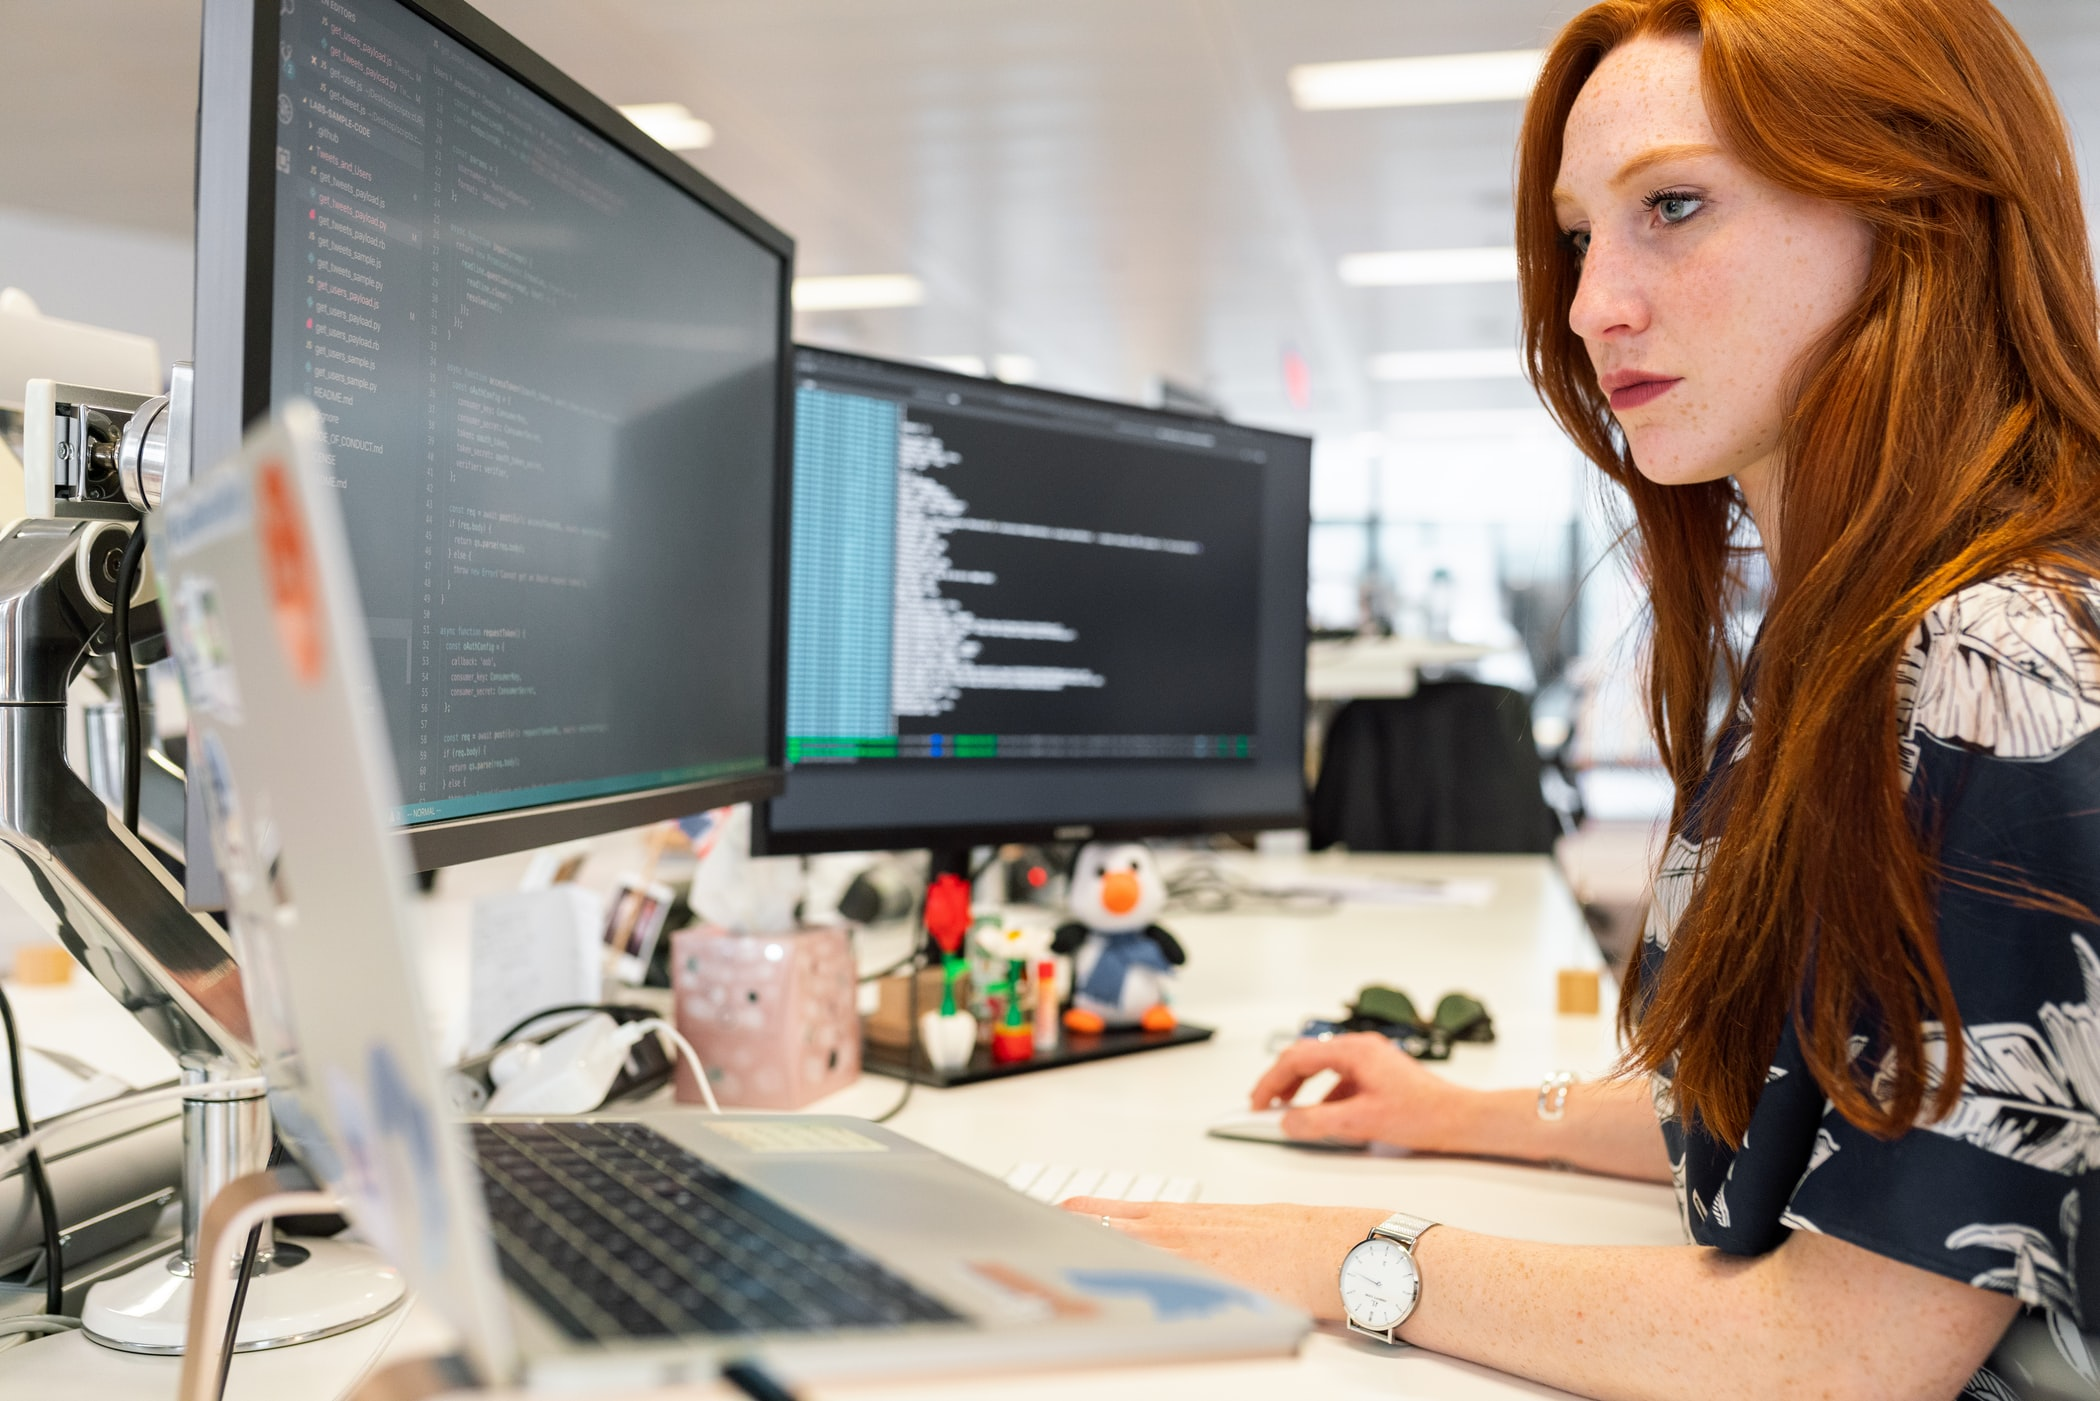 Why choose Elixir for software development